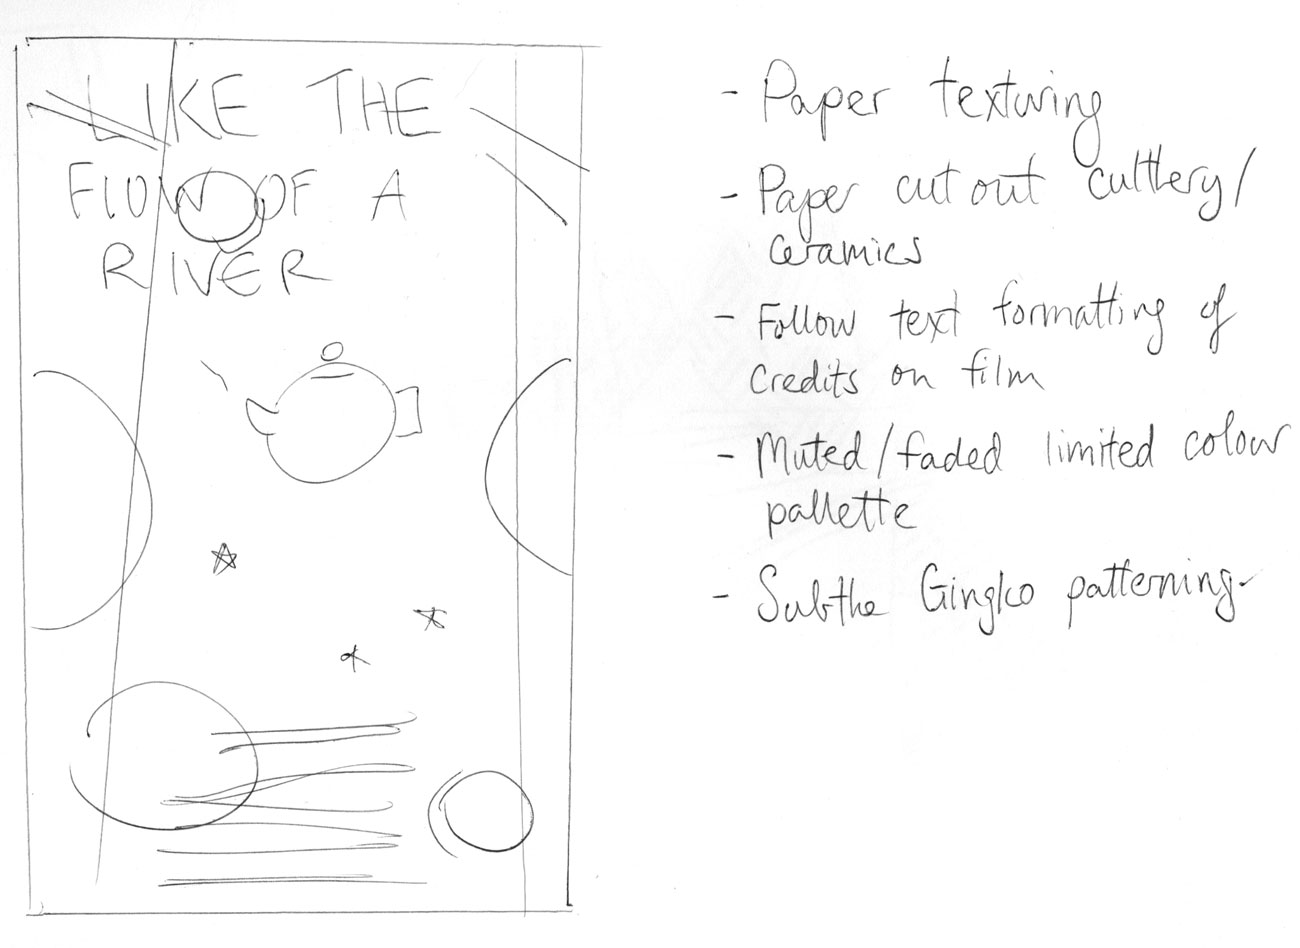 Concept Sketch & Notes